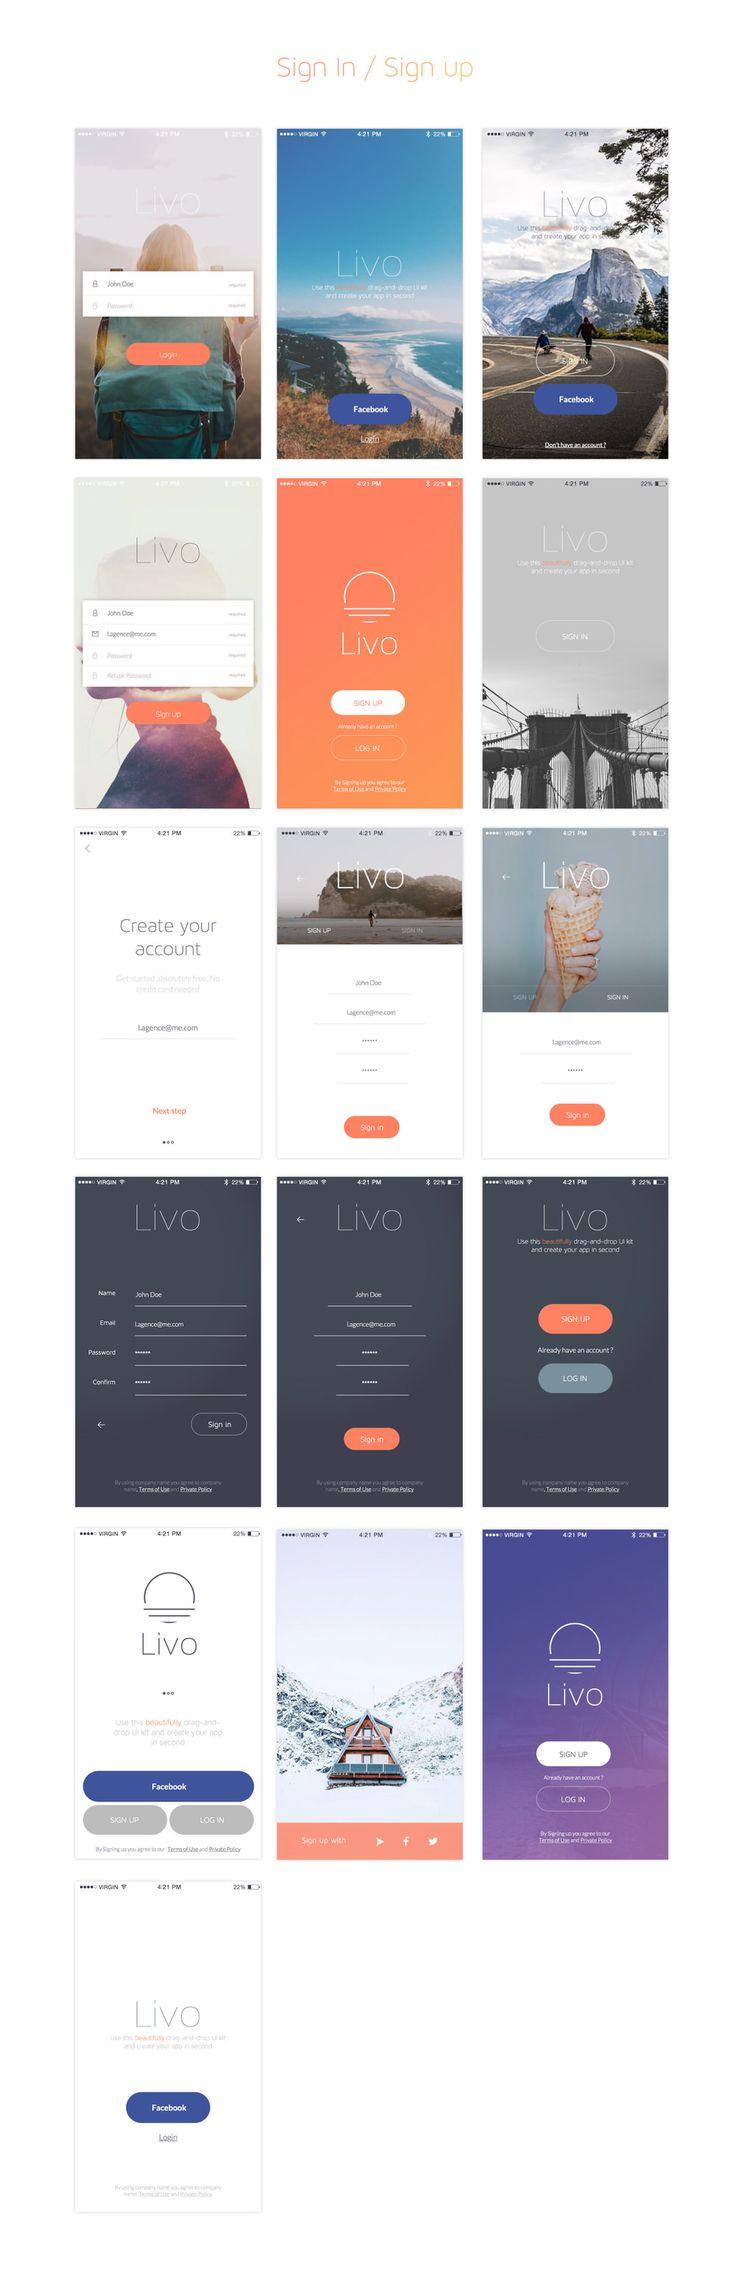 Livo UI Kit for Sketch